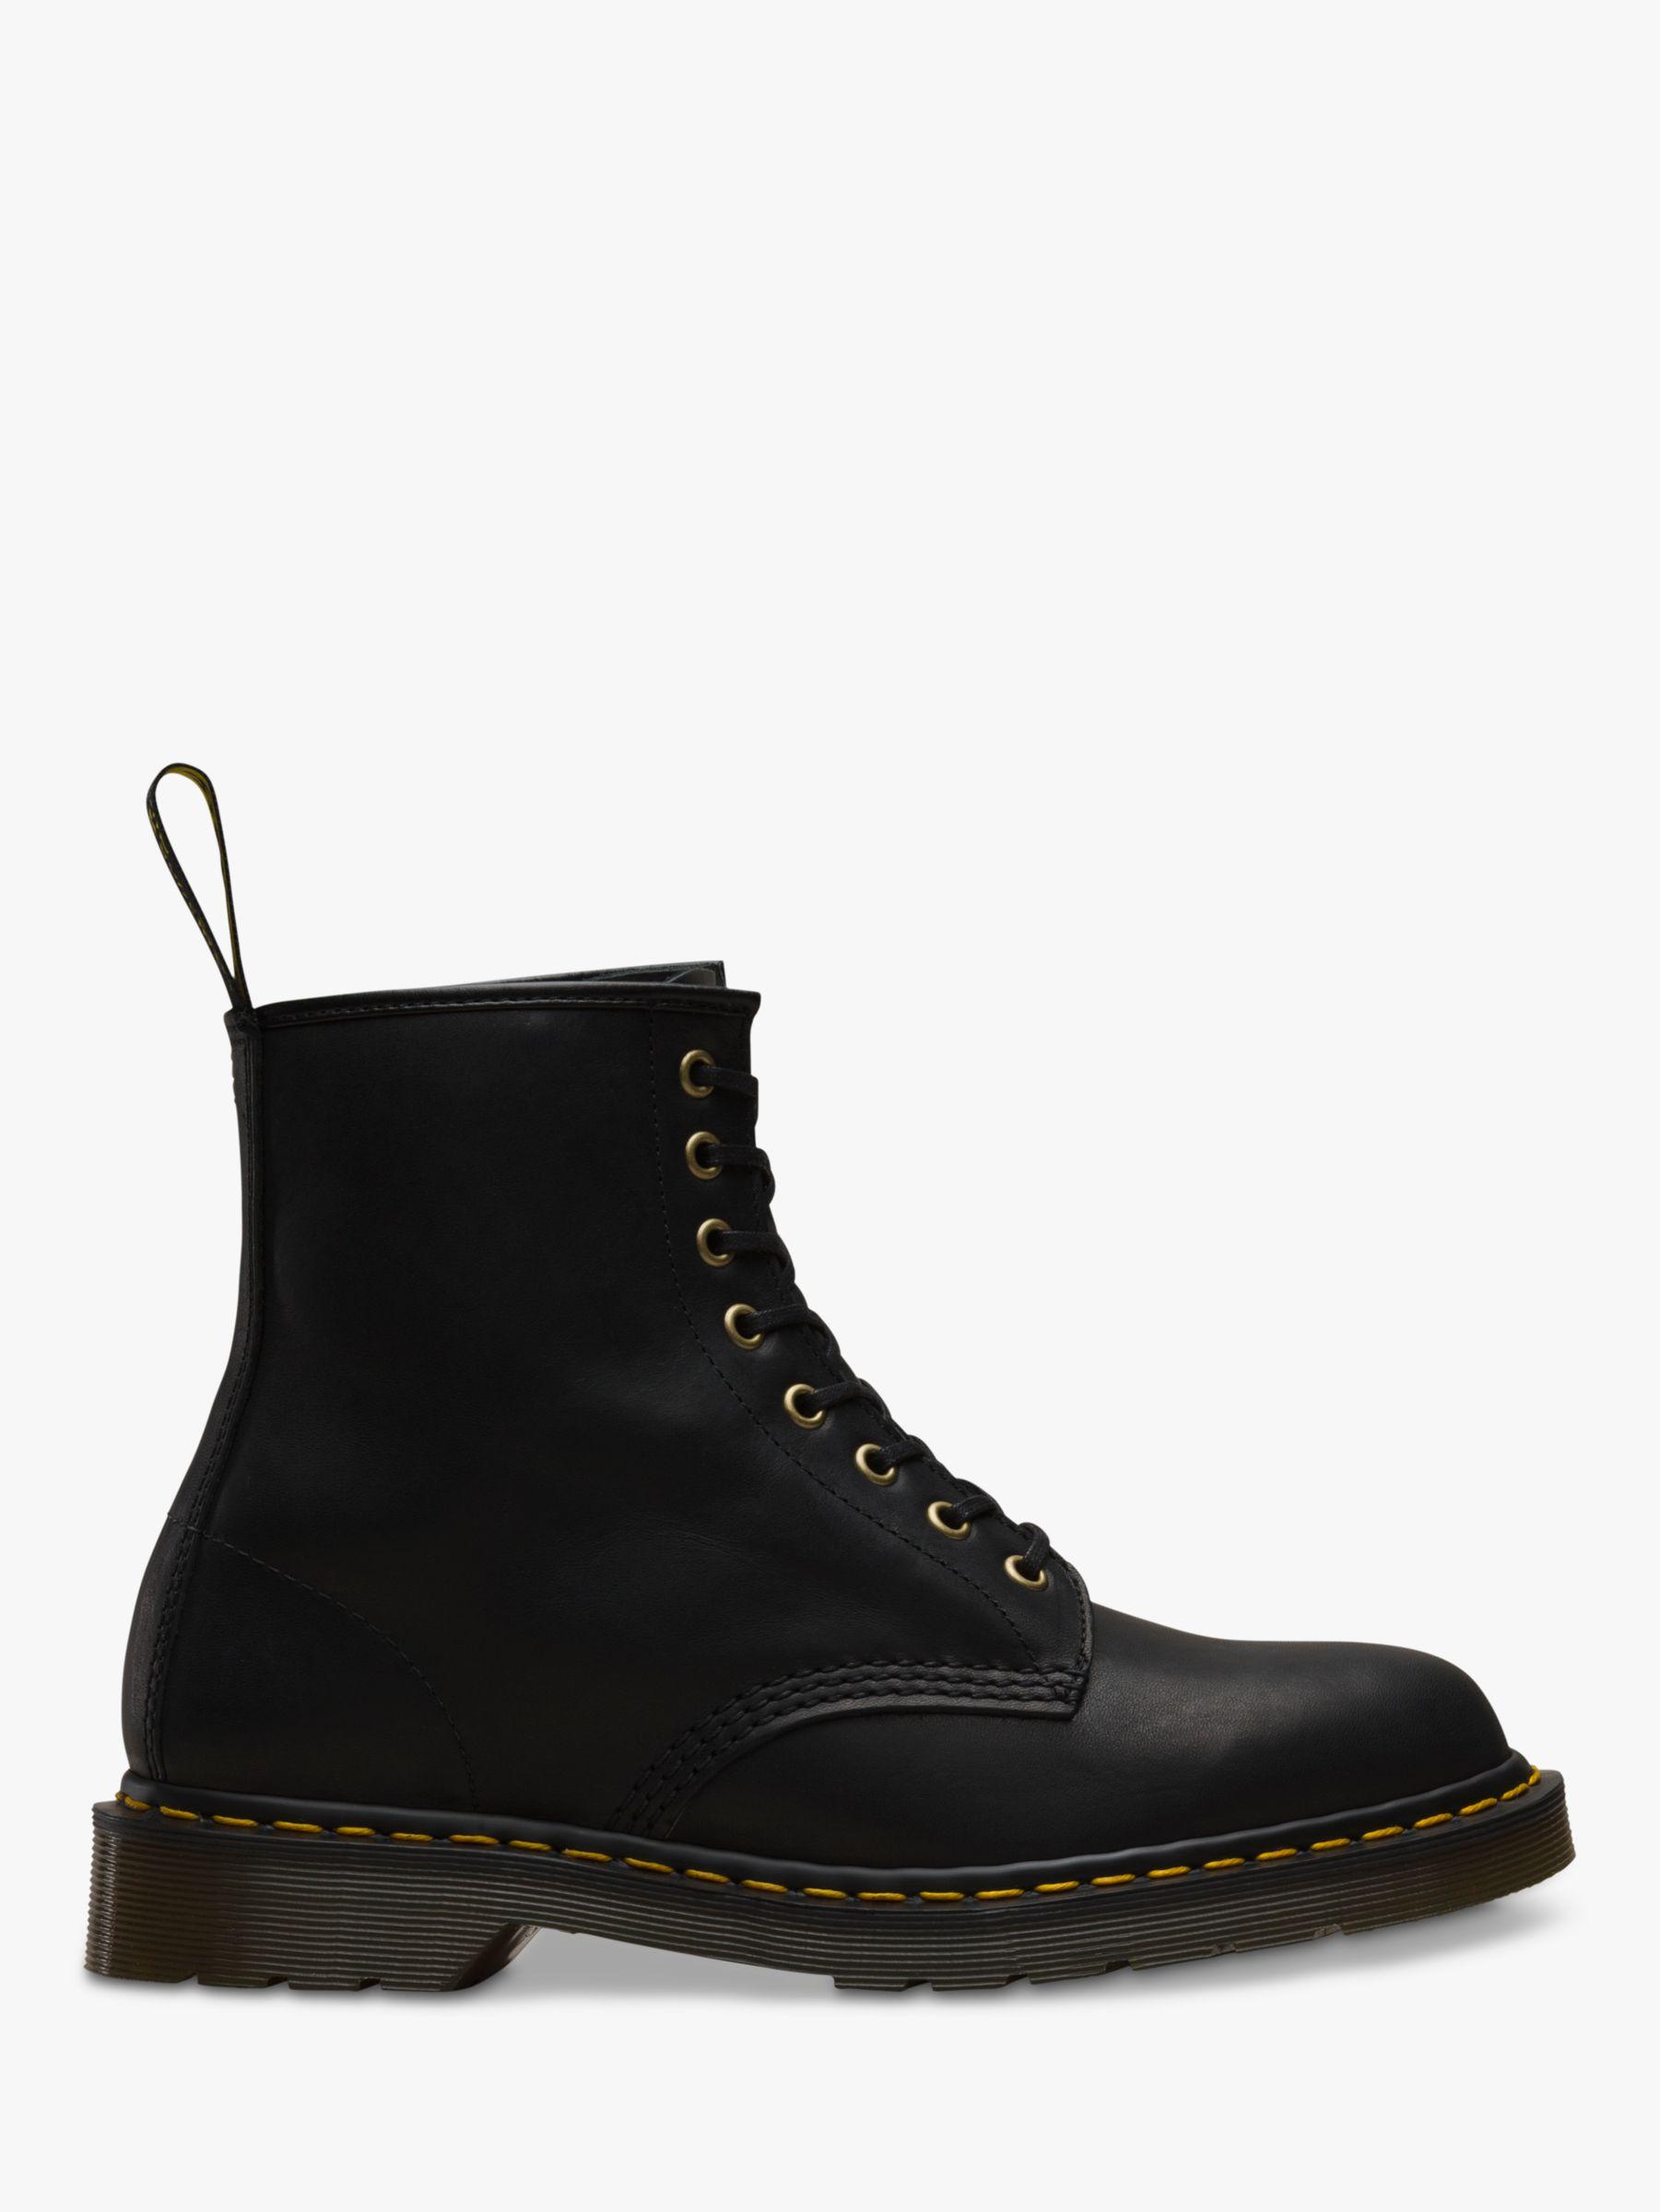 Dr Martens Dr Martens 1460 Dublin Boots, Black